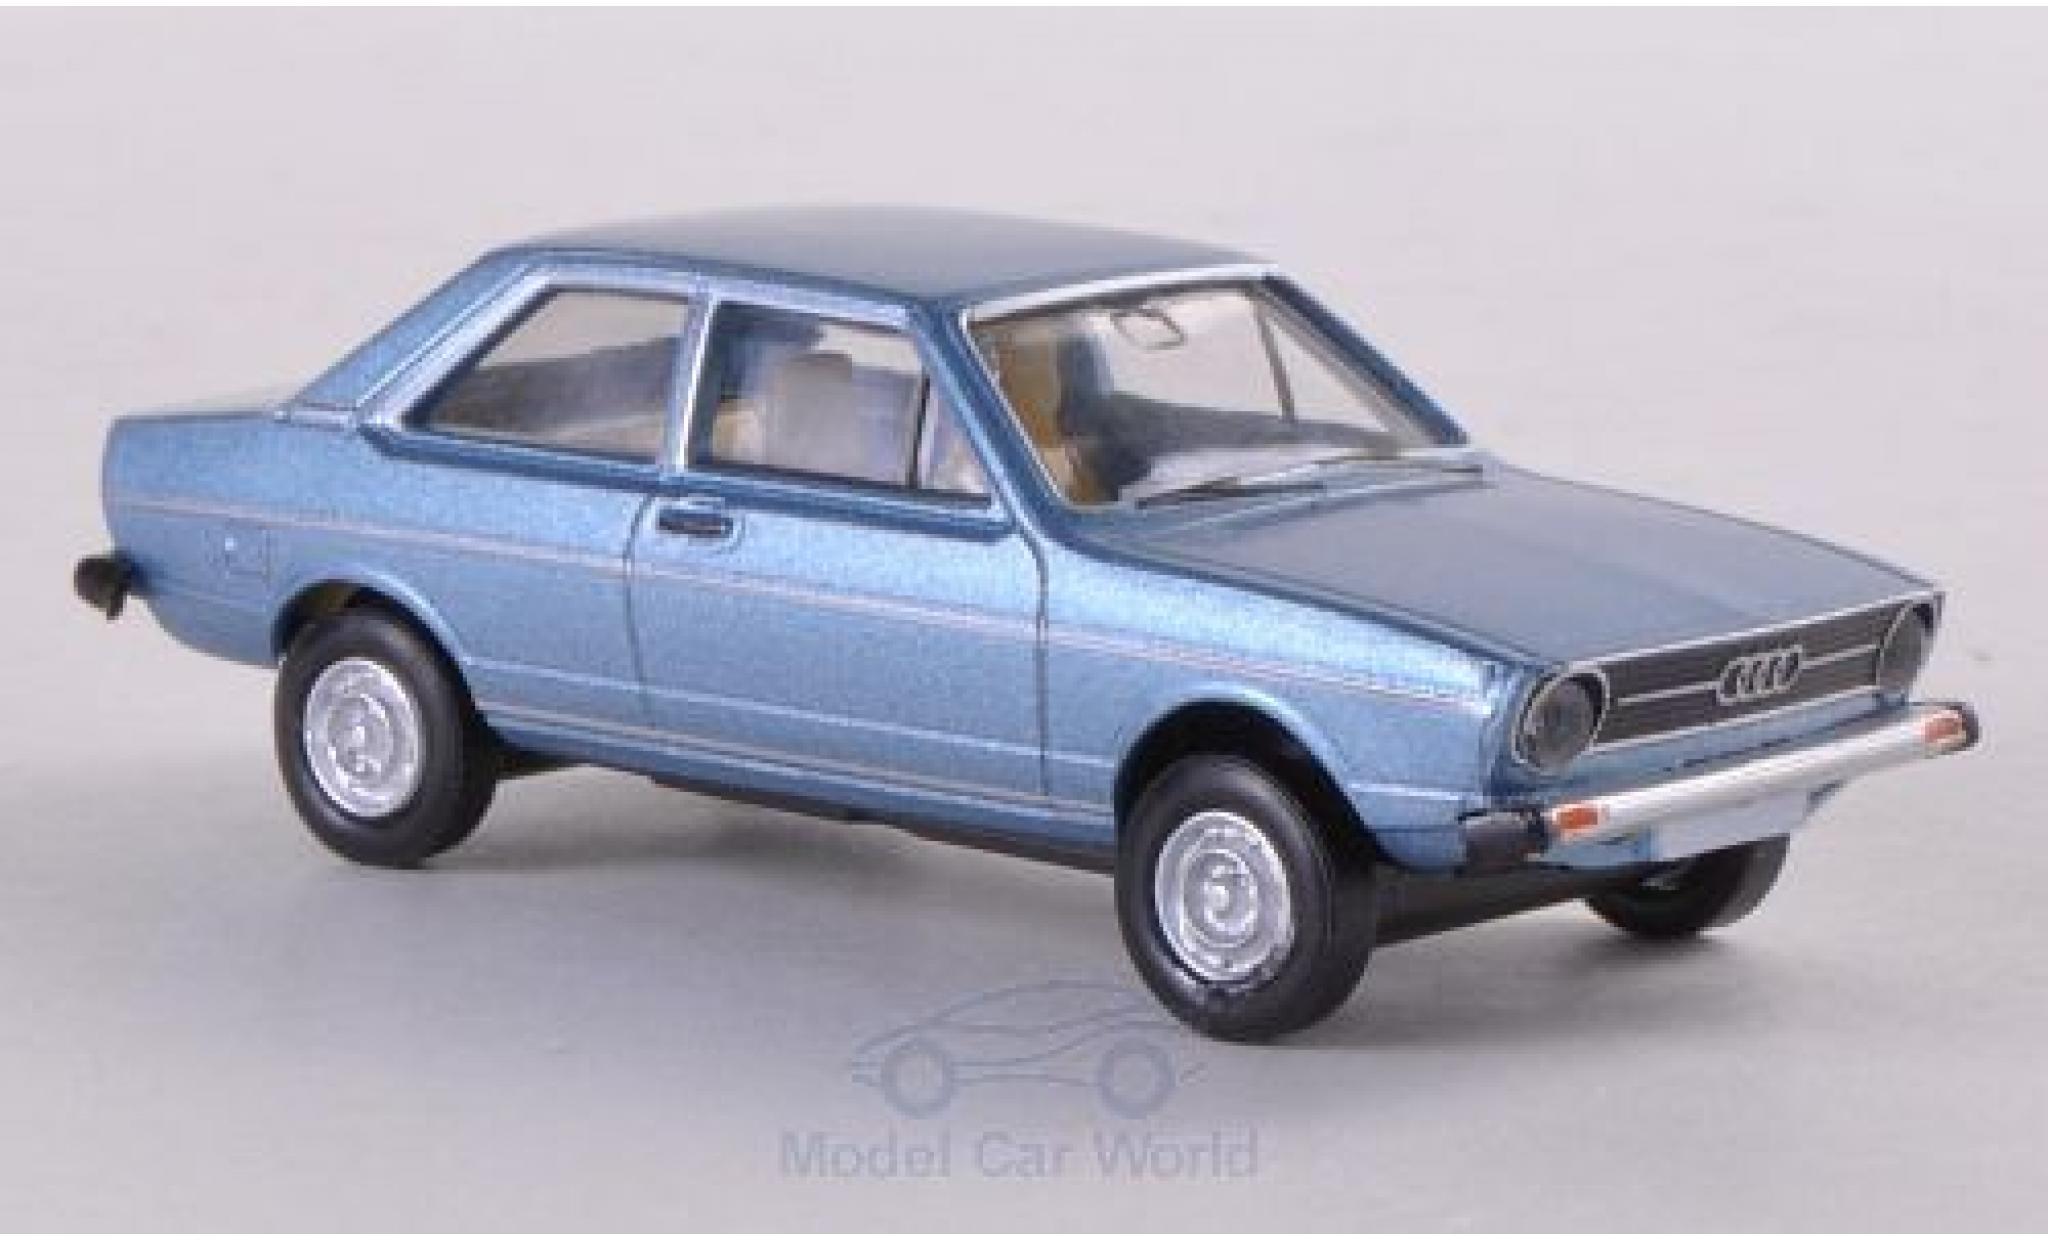 Audi 80 1/87 Brekina metallise bleue